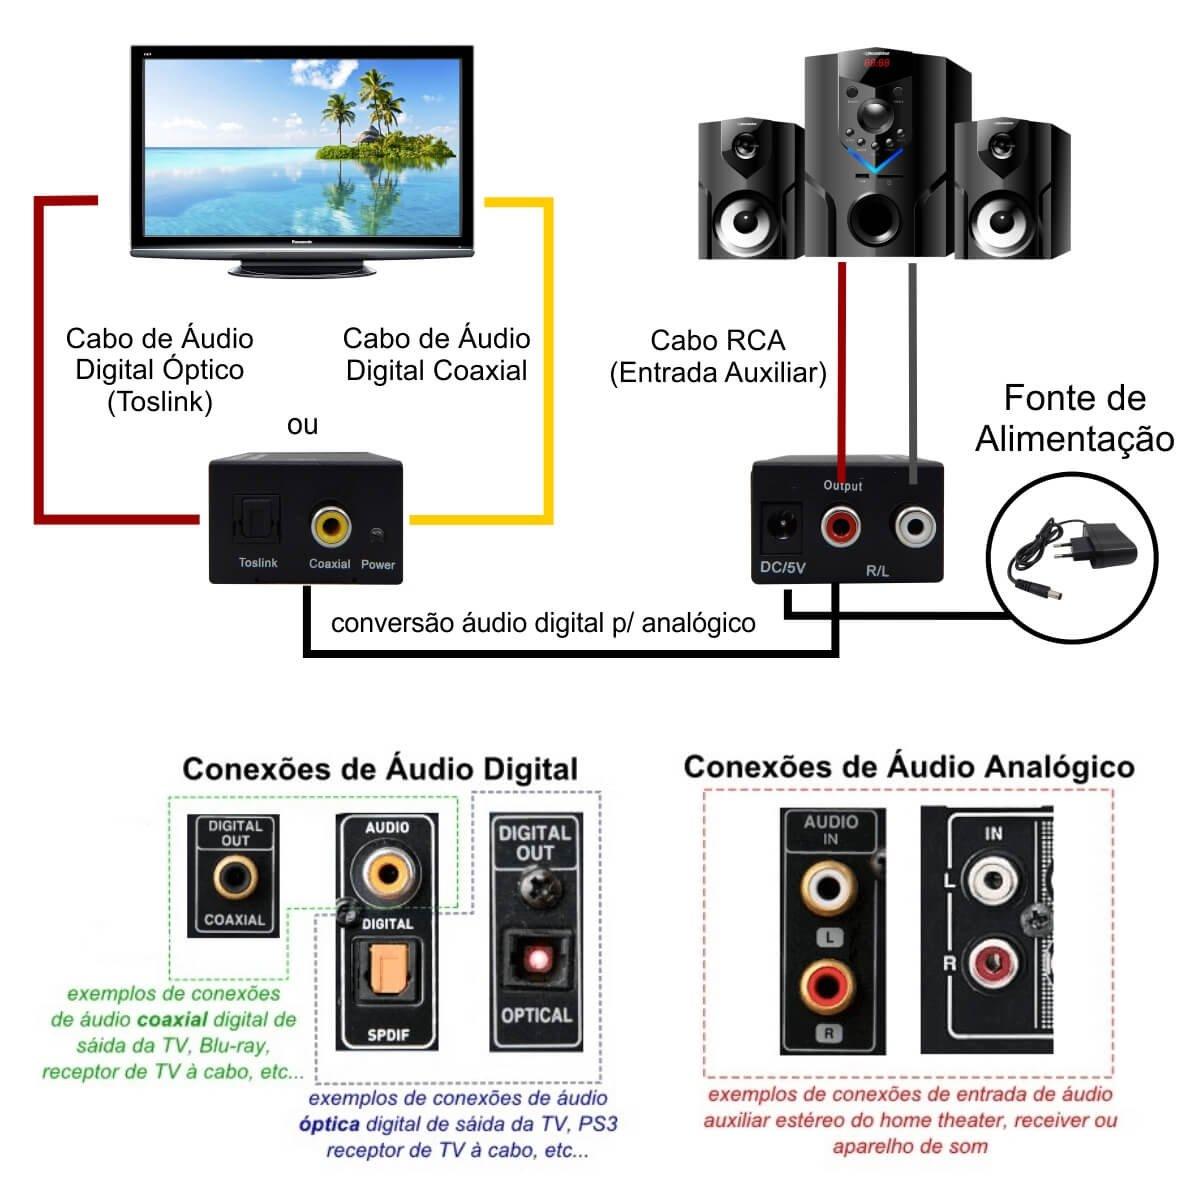 Conversor de Áudio Digital Óptico e Coaxial para Analógico Rca